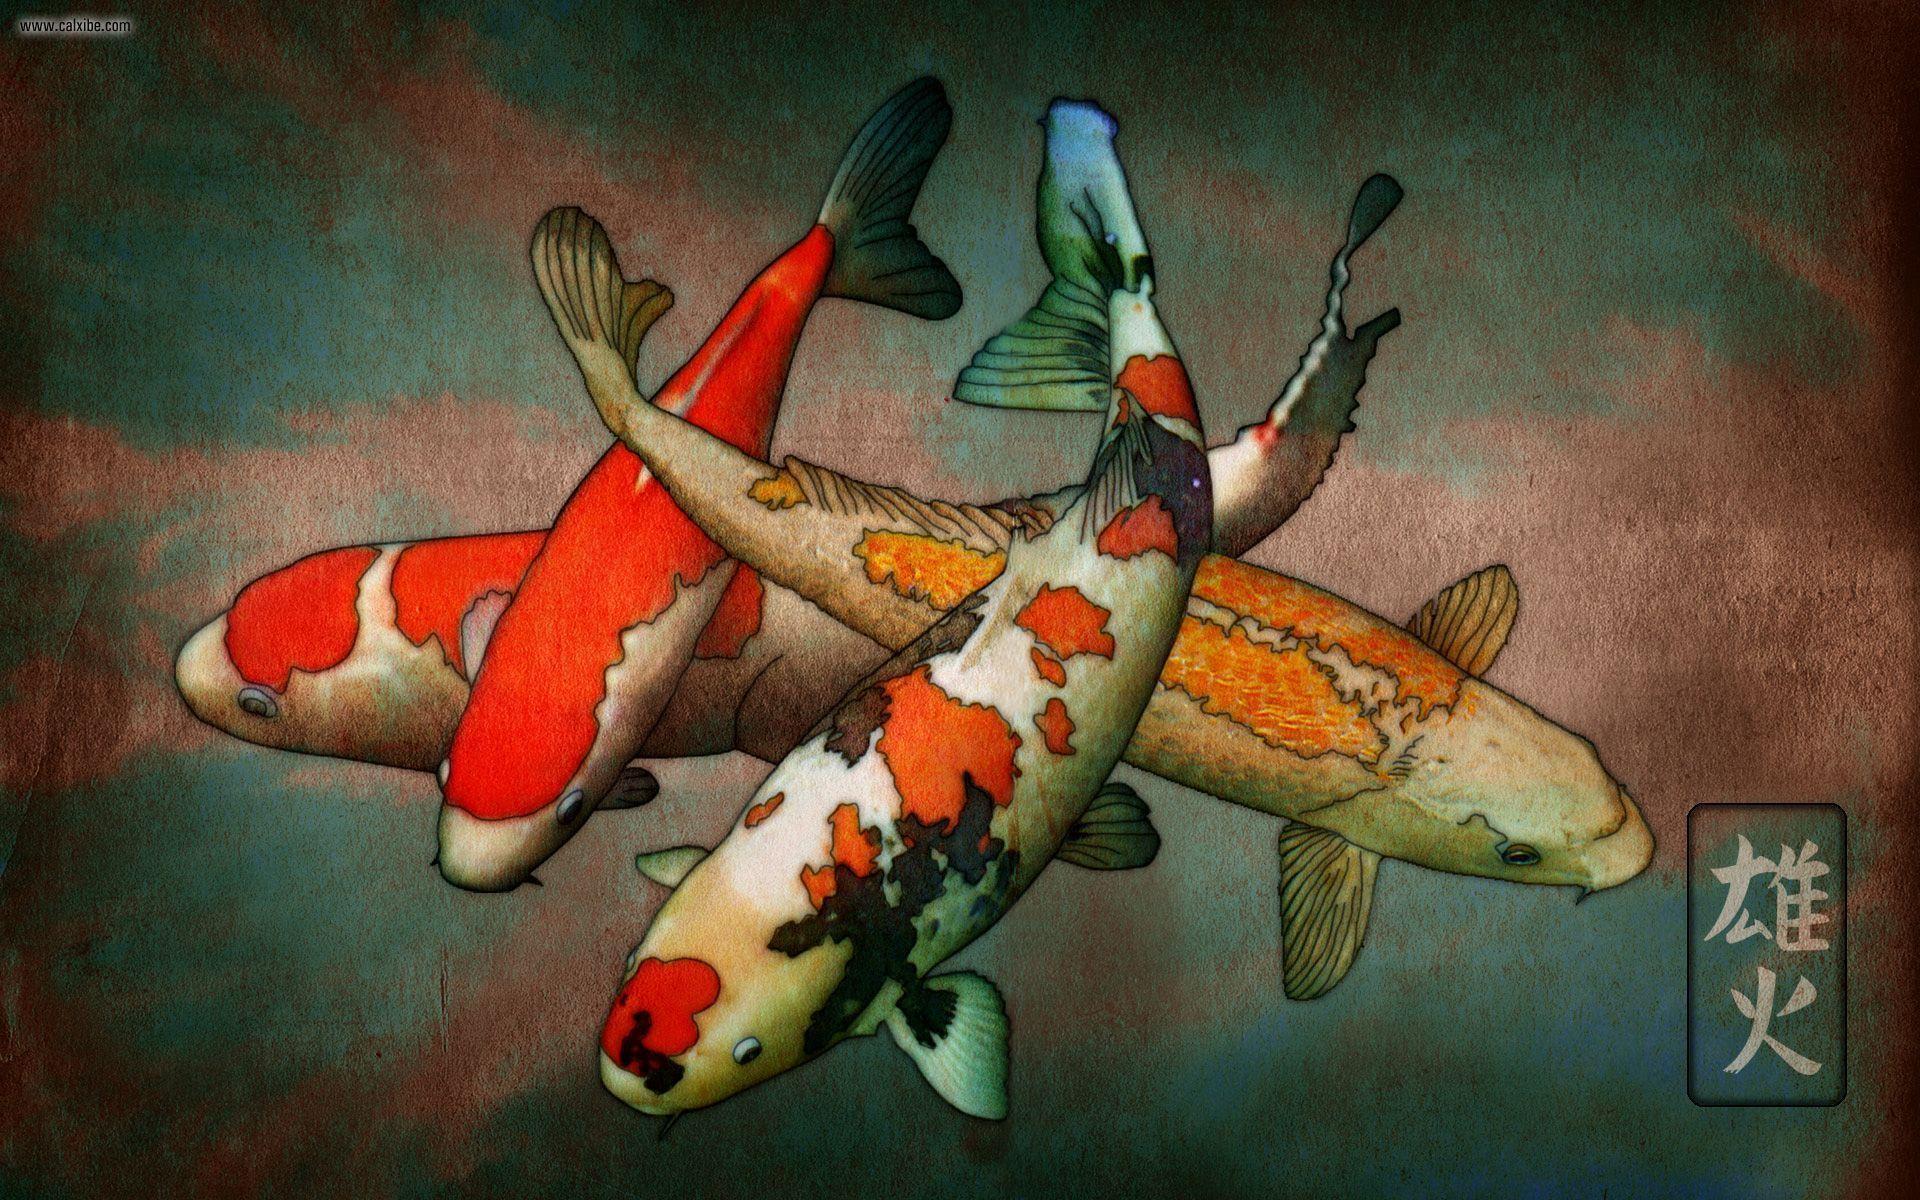 Koi Art Wallpapers Top Free Koi Art Backgrounds